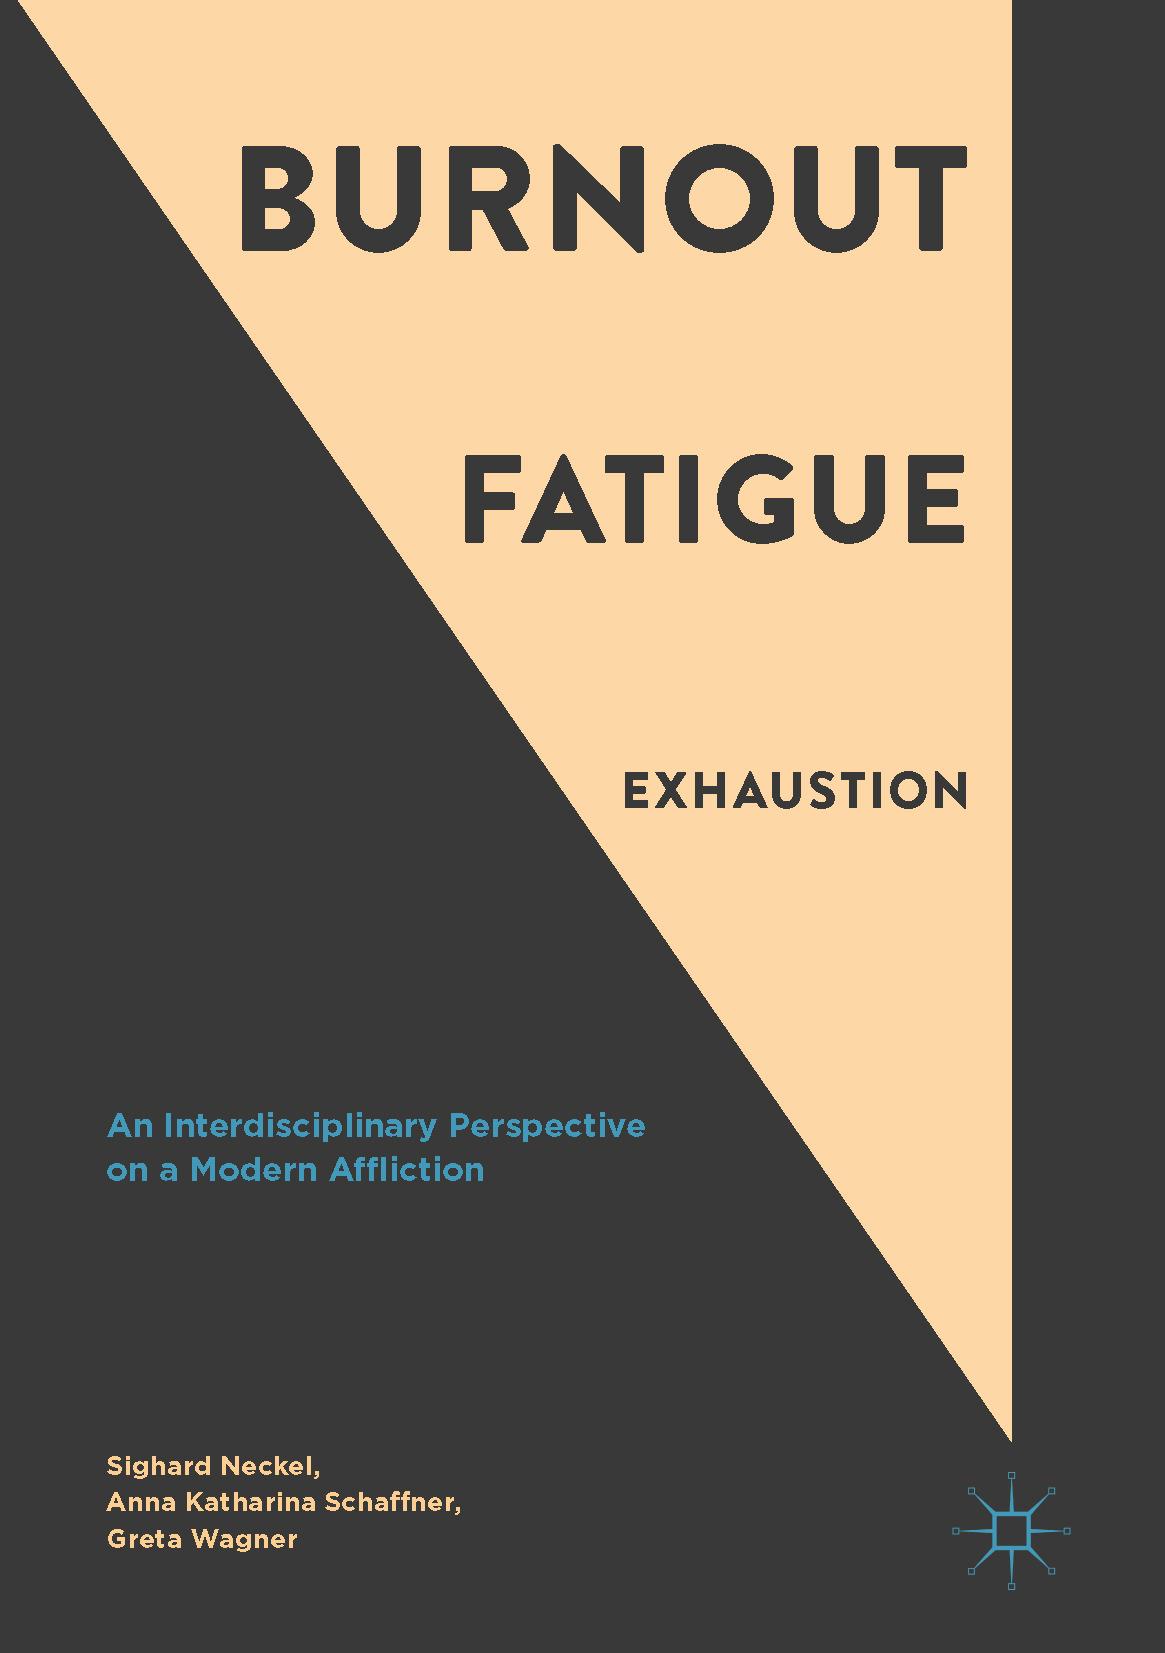 Neckel, Sighard - Burnout, Fatigue, Exhaustion, ebook